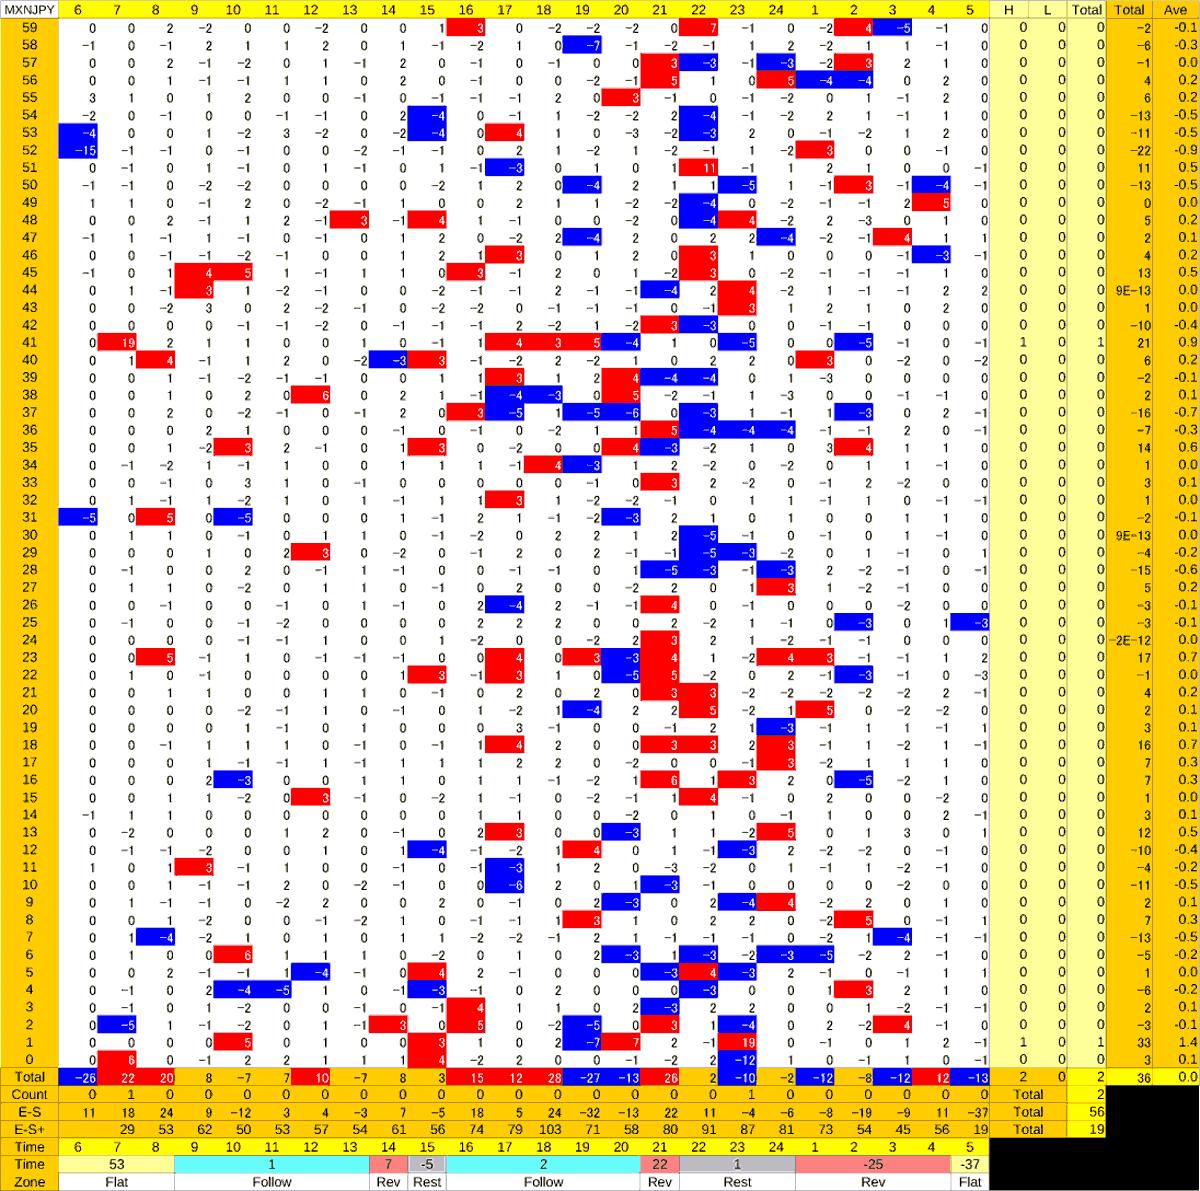 20200603_HS(3)MXNJPY